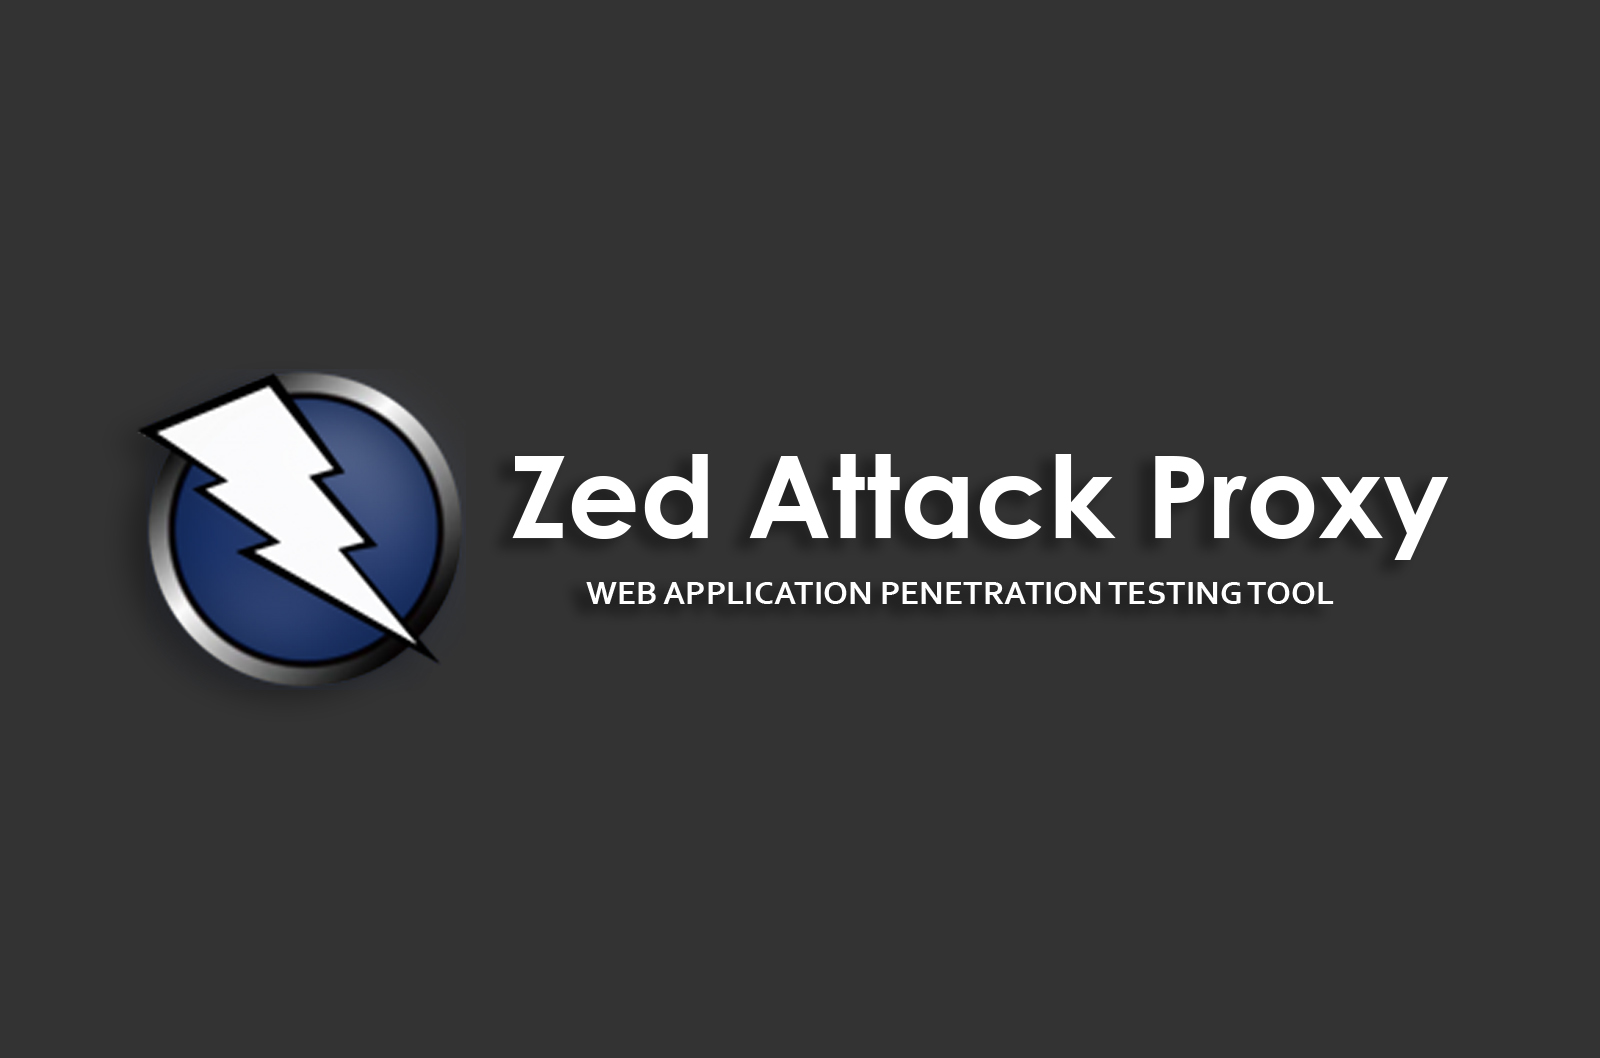 Zed Attack Proxy